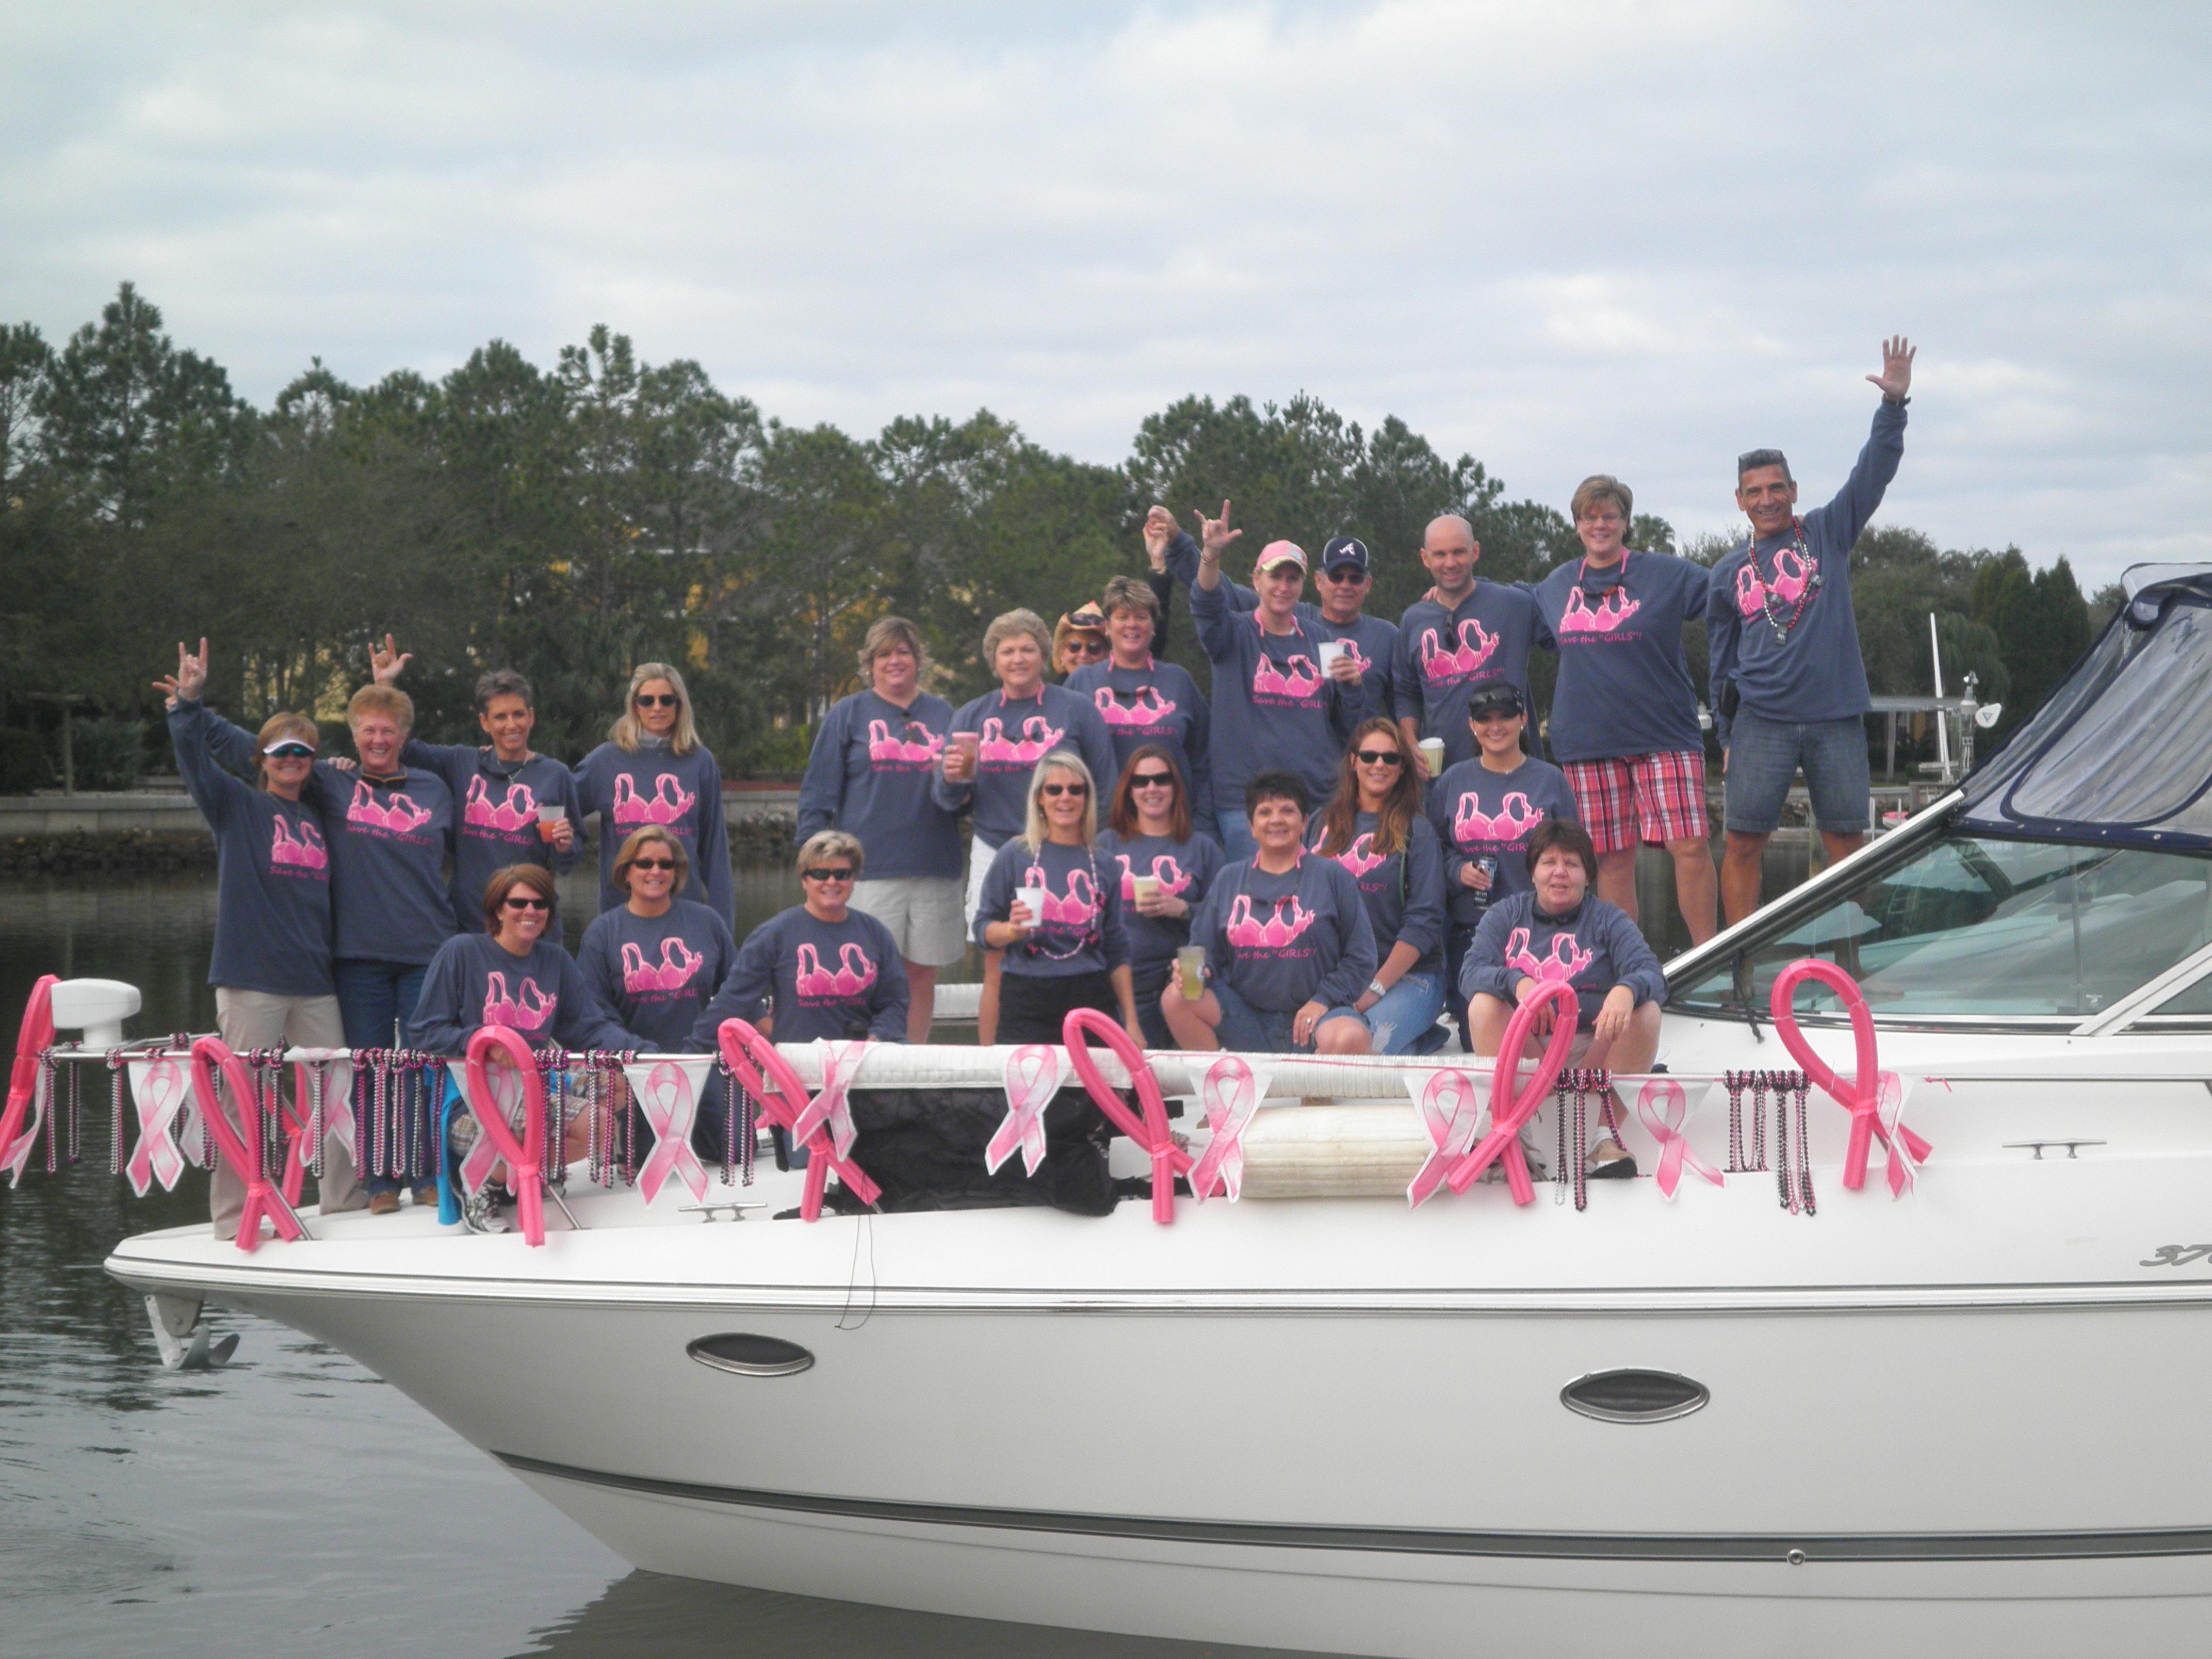 Shirt design tampa - Save The Girls Gasparilla 2012 Tampa Fl T Shirt Photo